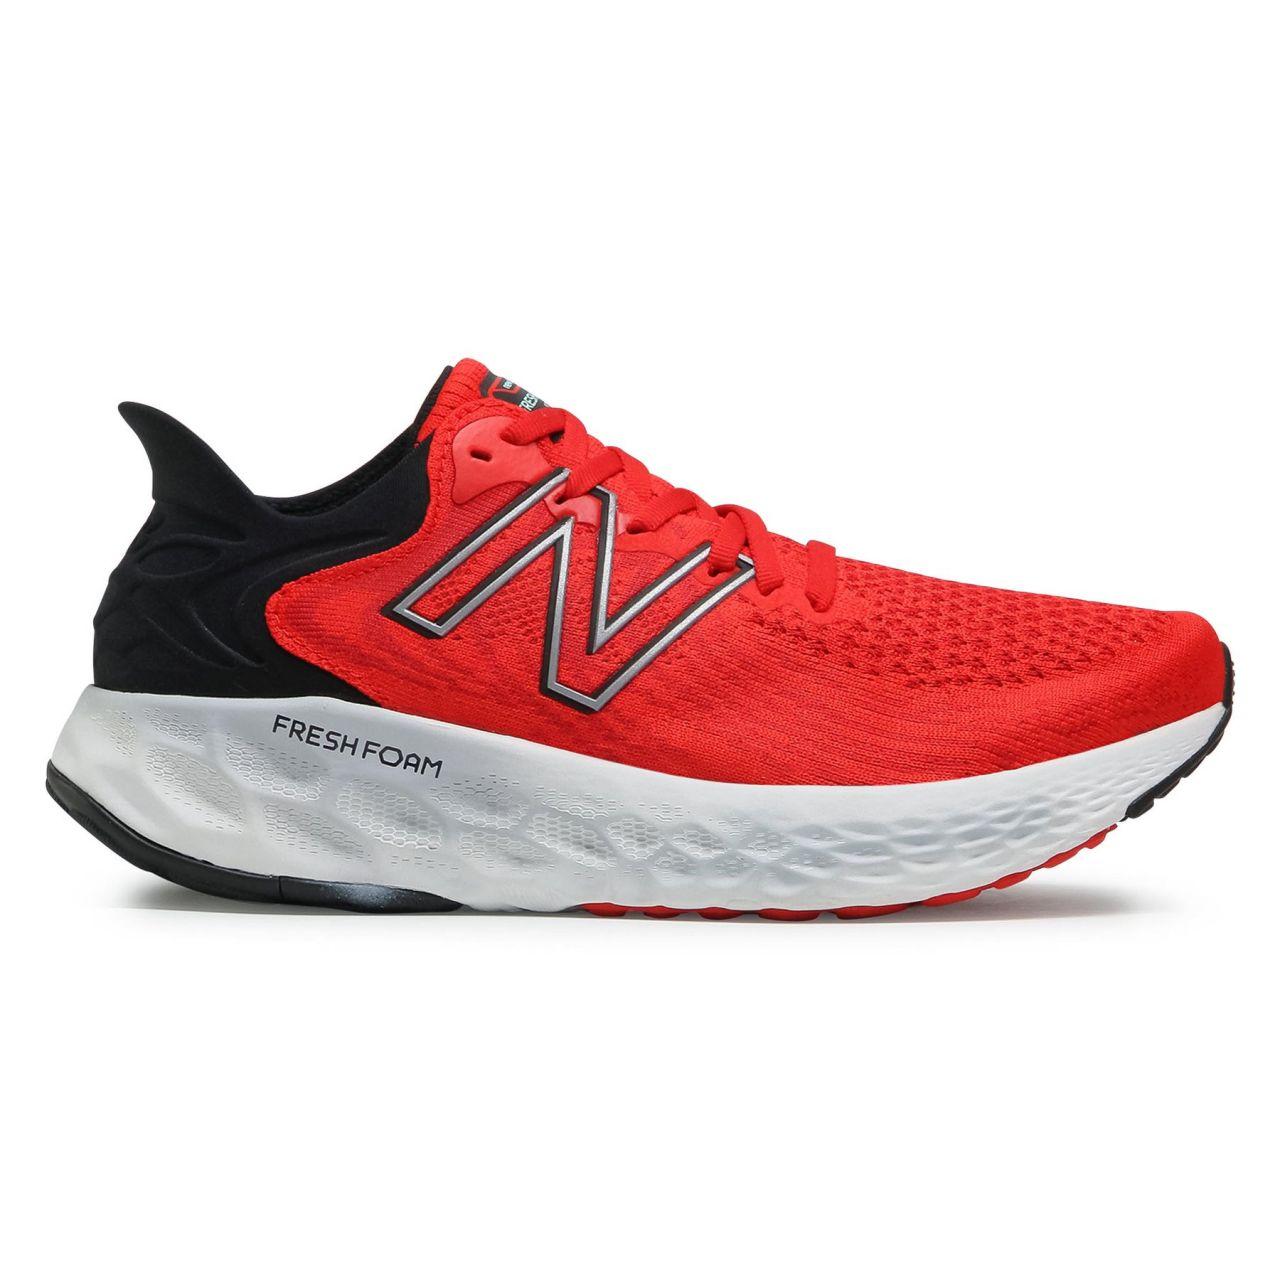 NEW BALANCE 1080 V11 ROUGE Chaussures de running